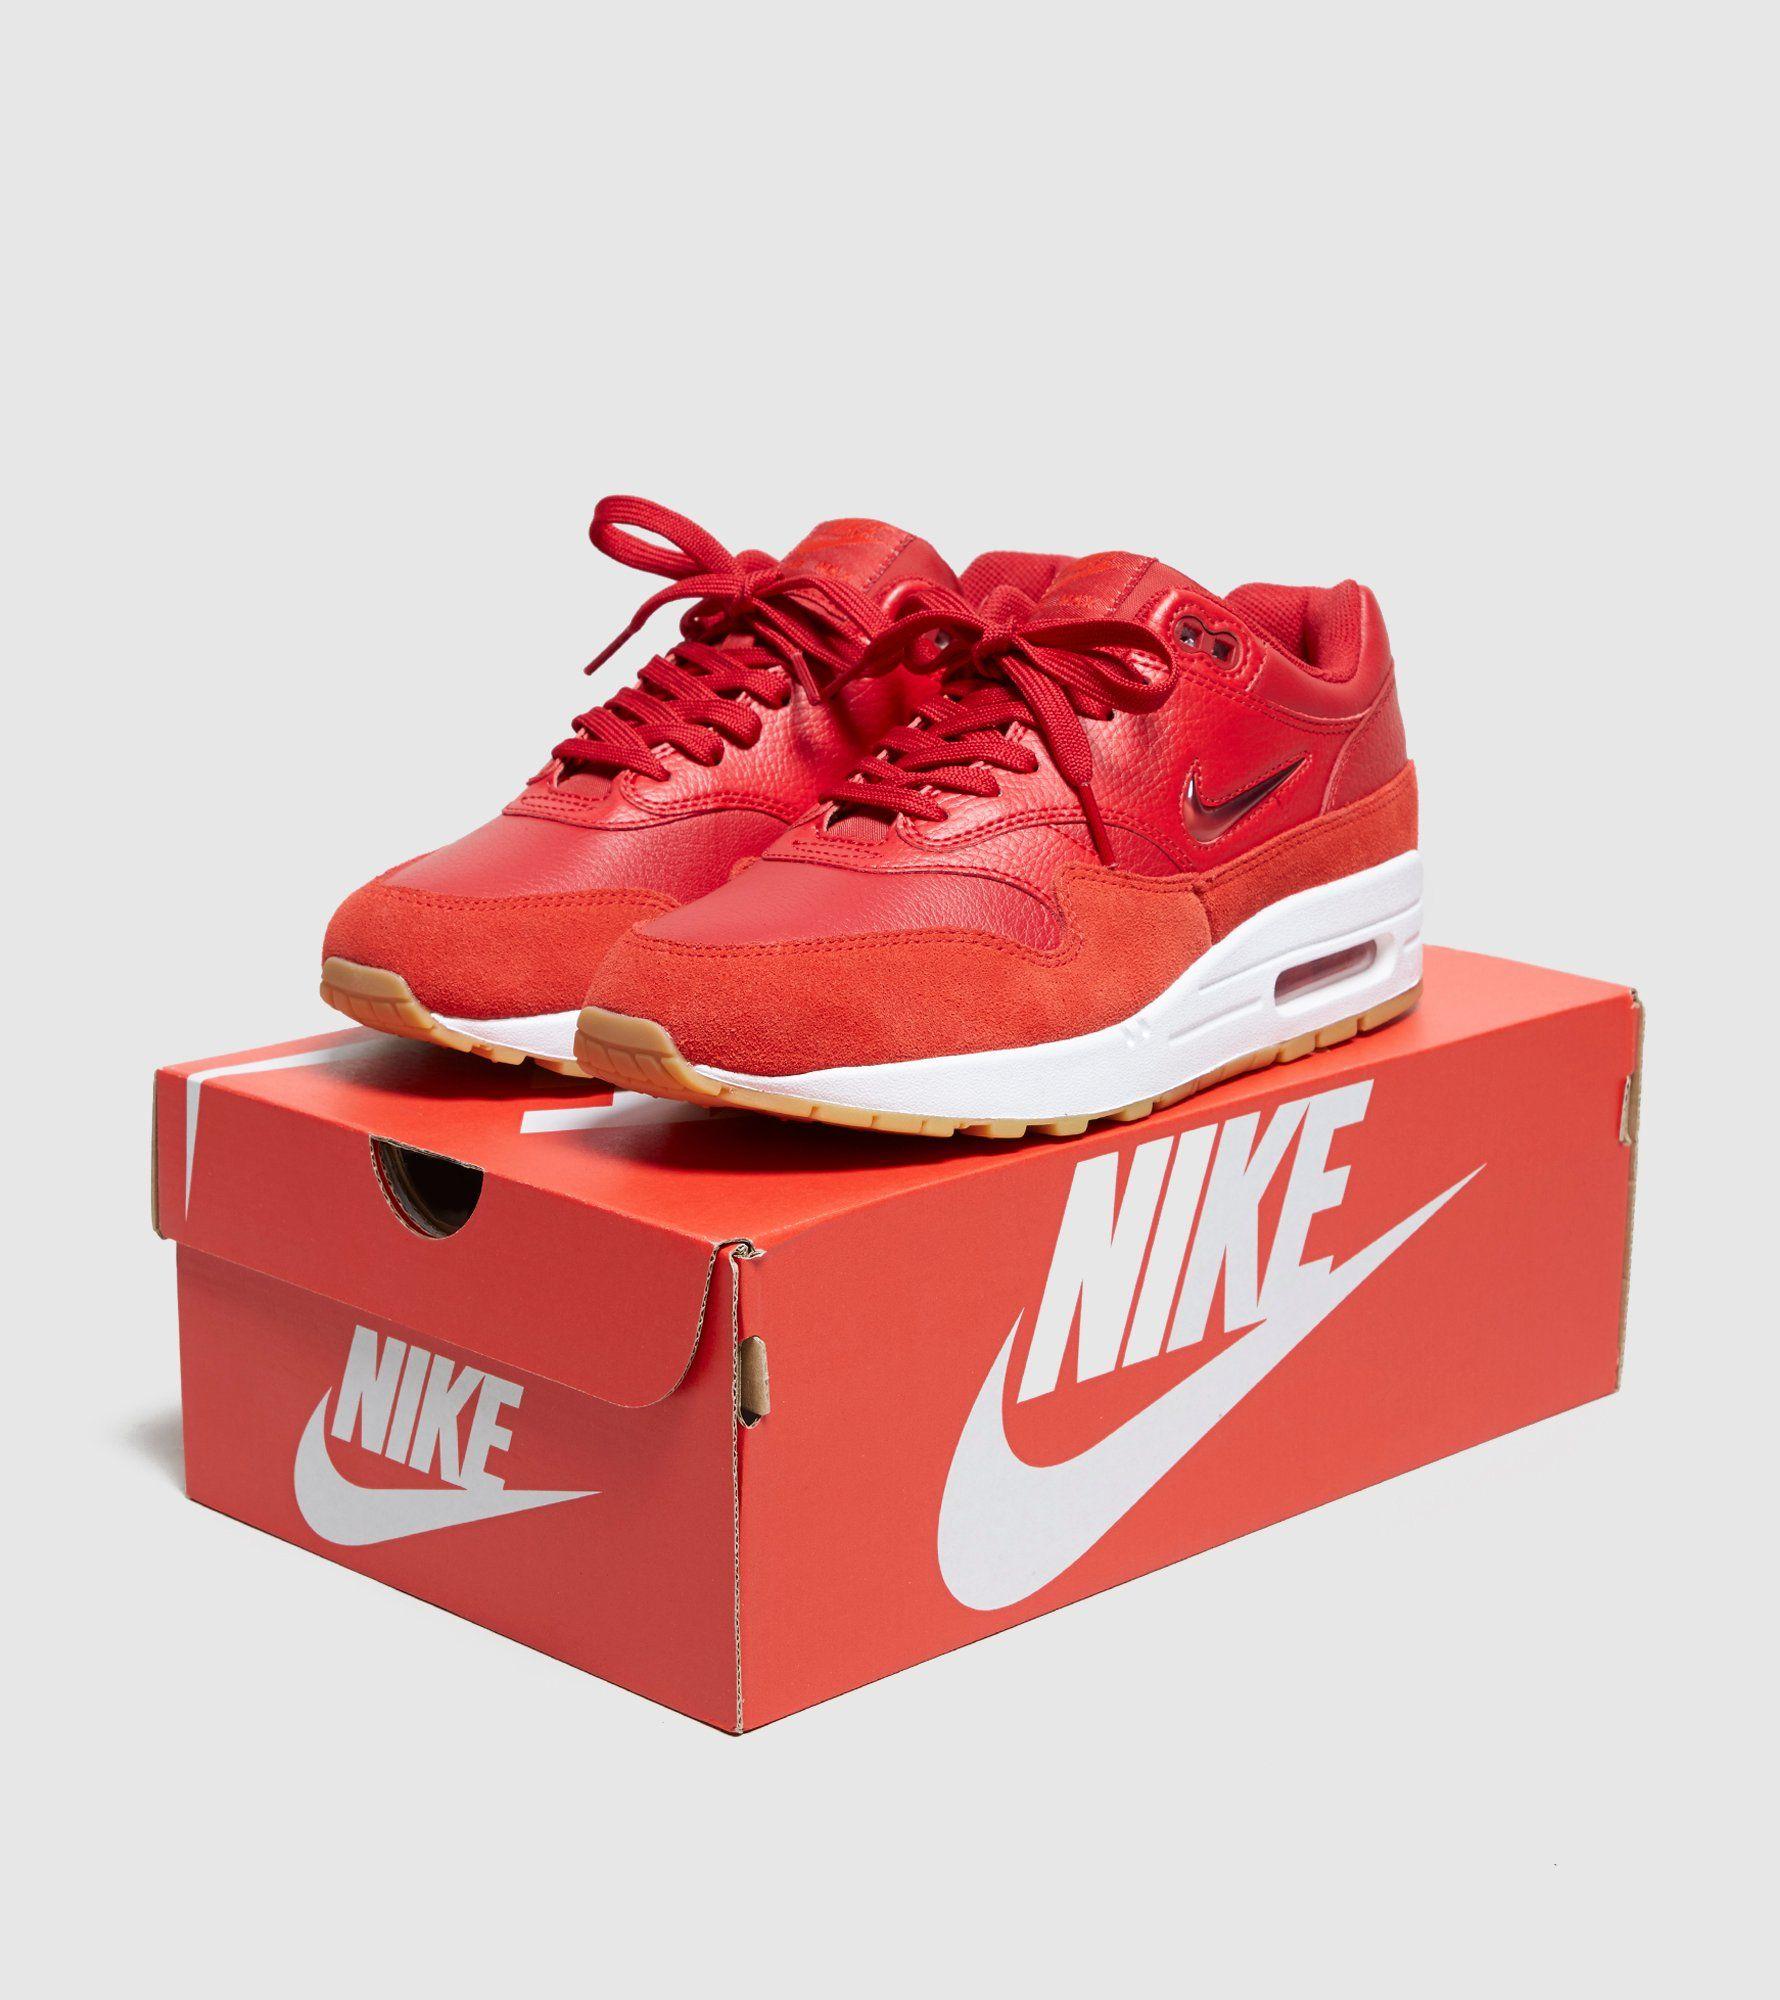 Nike Air Max 1 Premium SC Women's